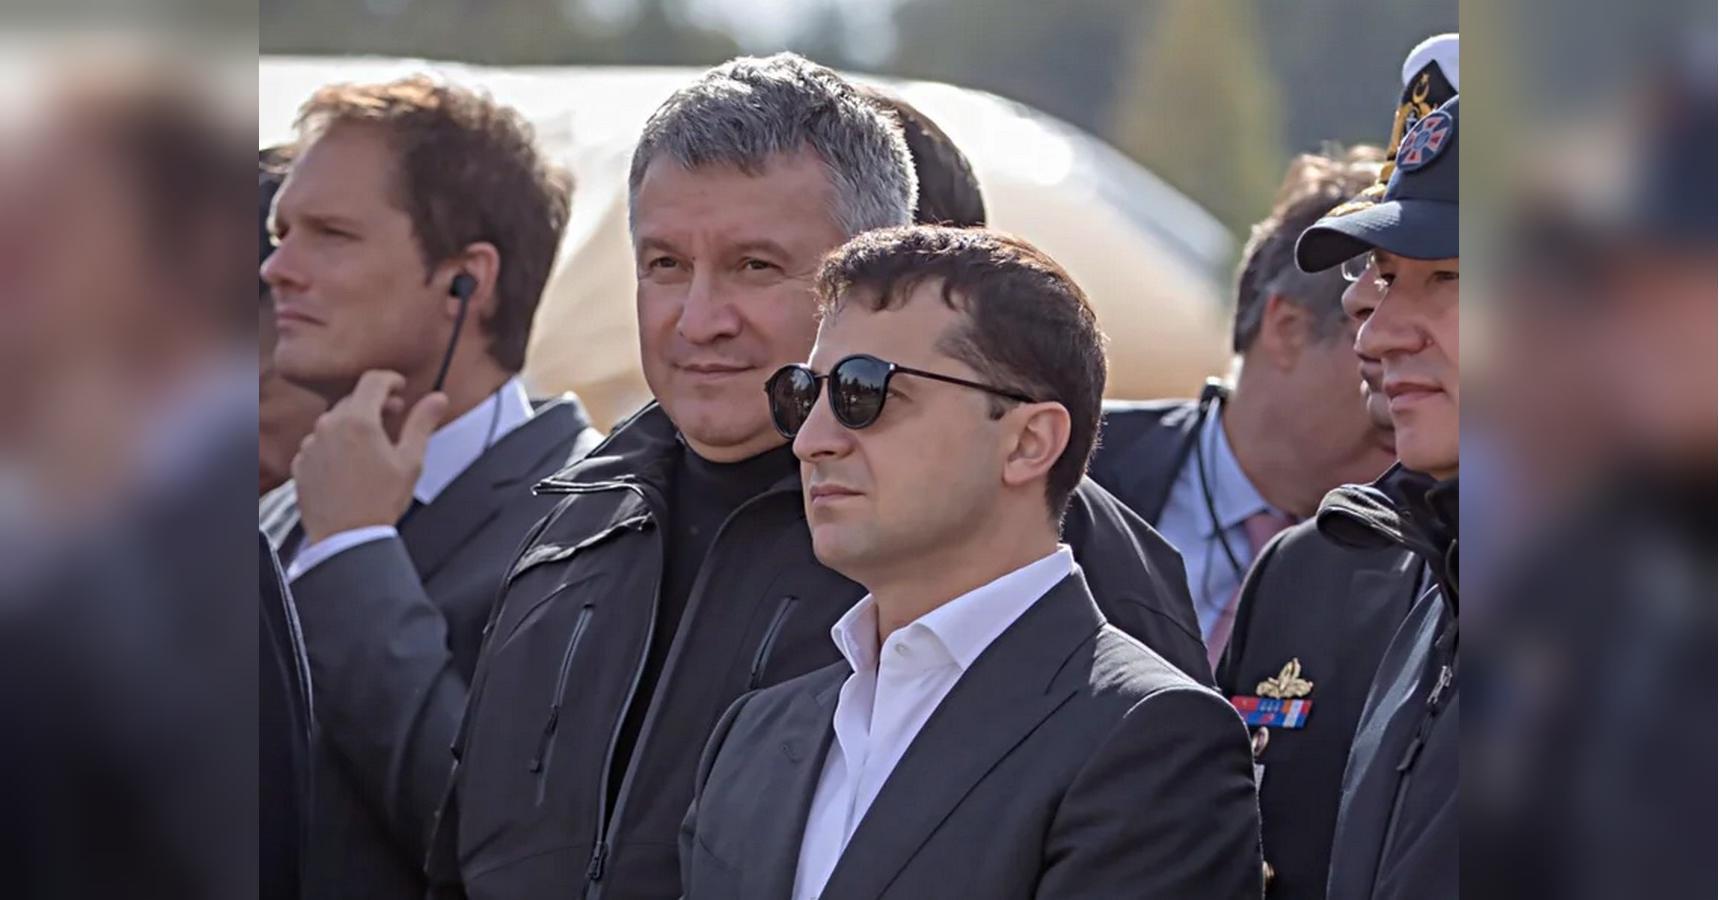 https://fakty.ua/photos2/article/33/85/338599_fb_195602.jpg